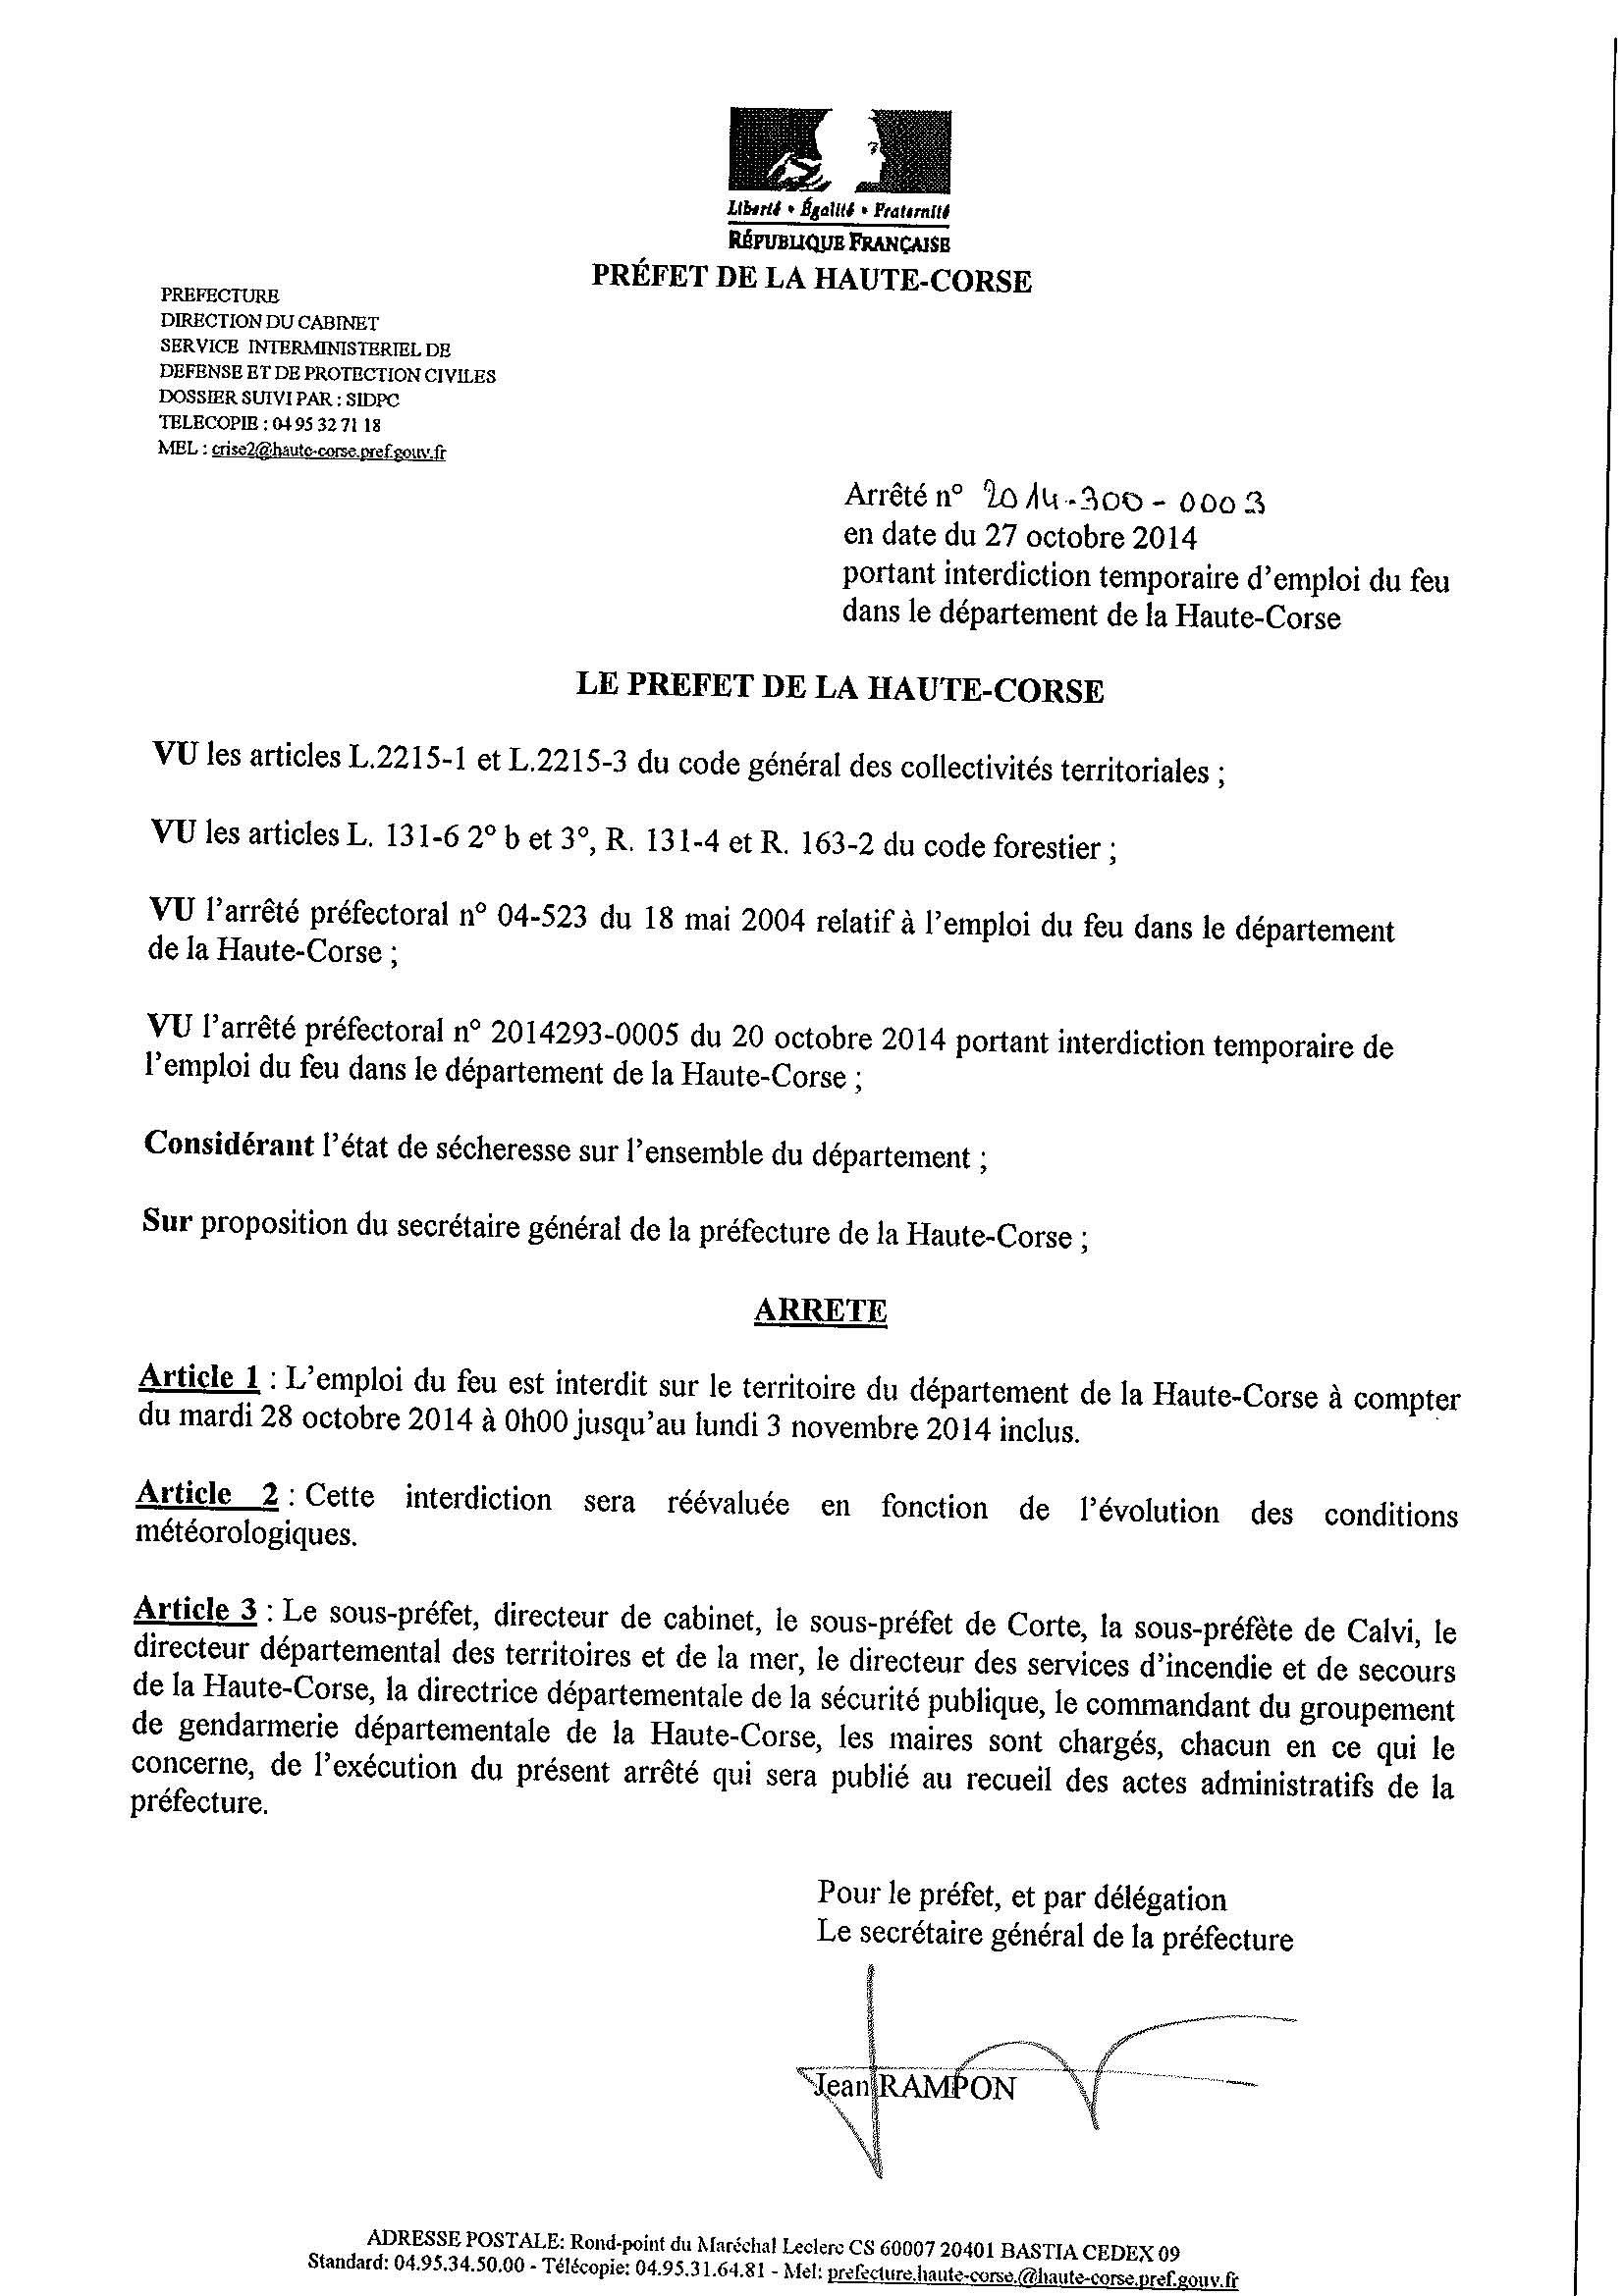 Corse : Interdiction de l'emploi du feu prorogée jusqu'au 3 Novembre